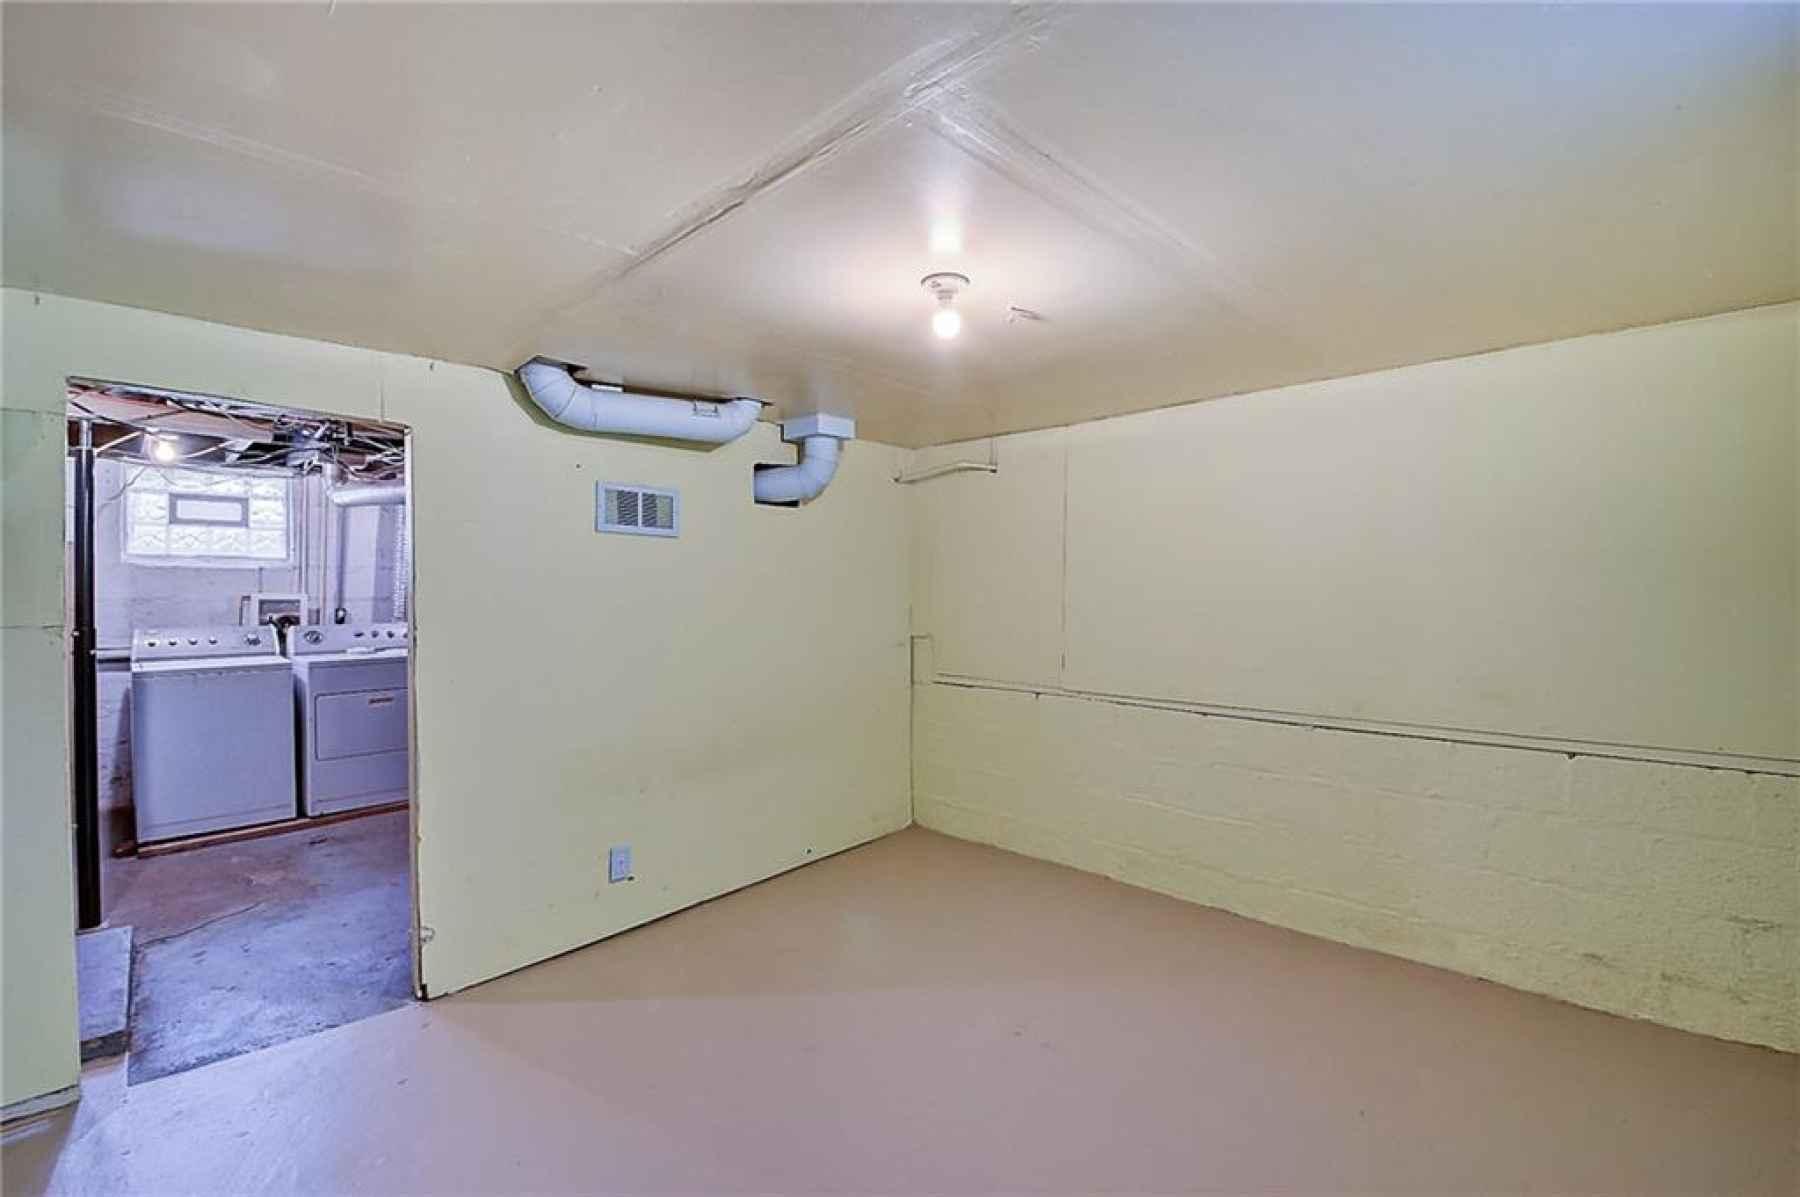 Basement bonus room looking into laundry and storage area.